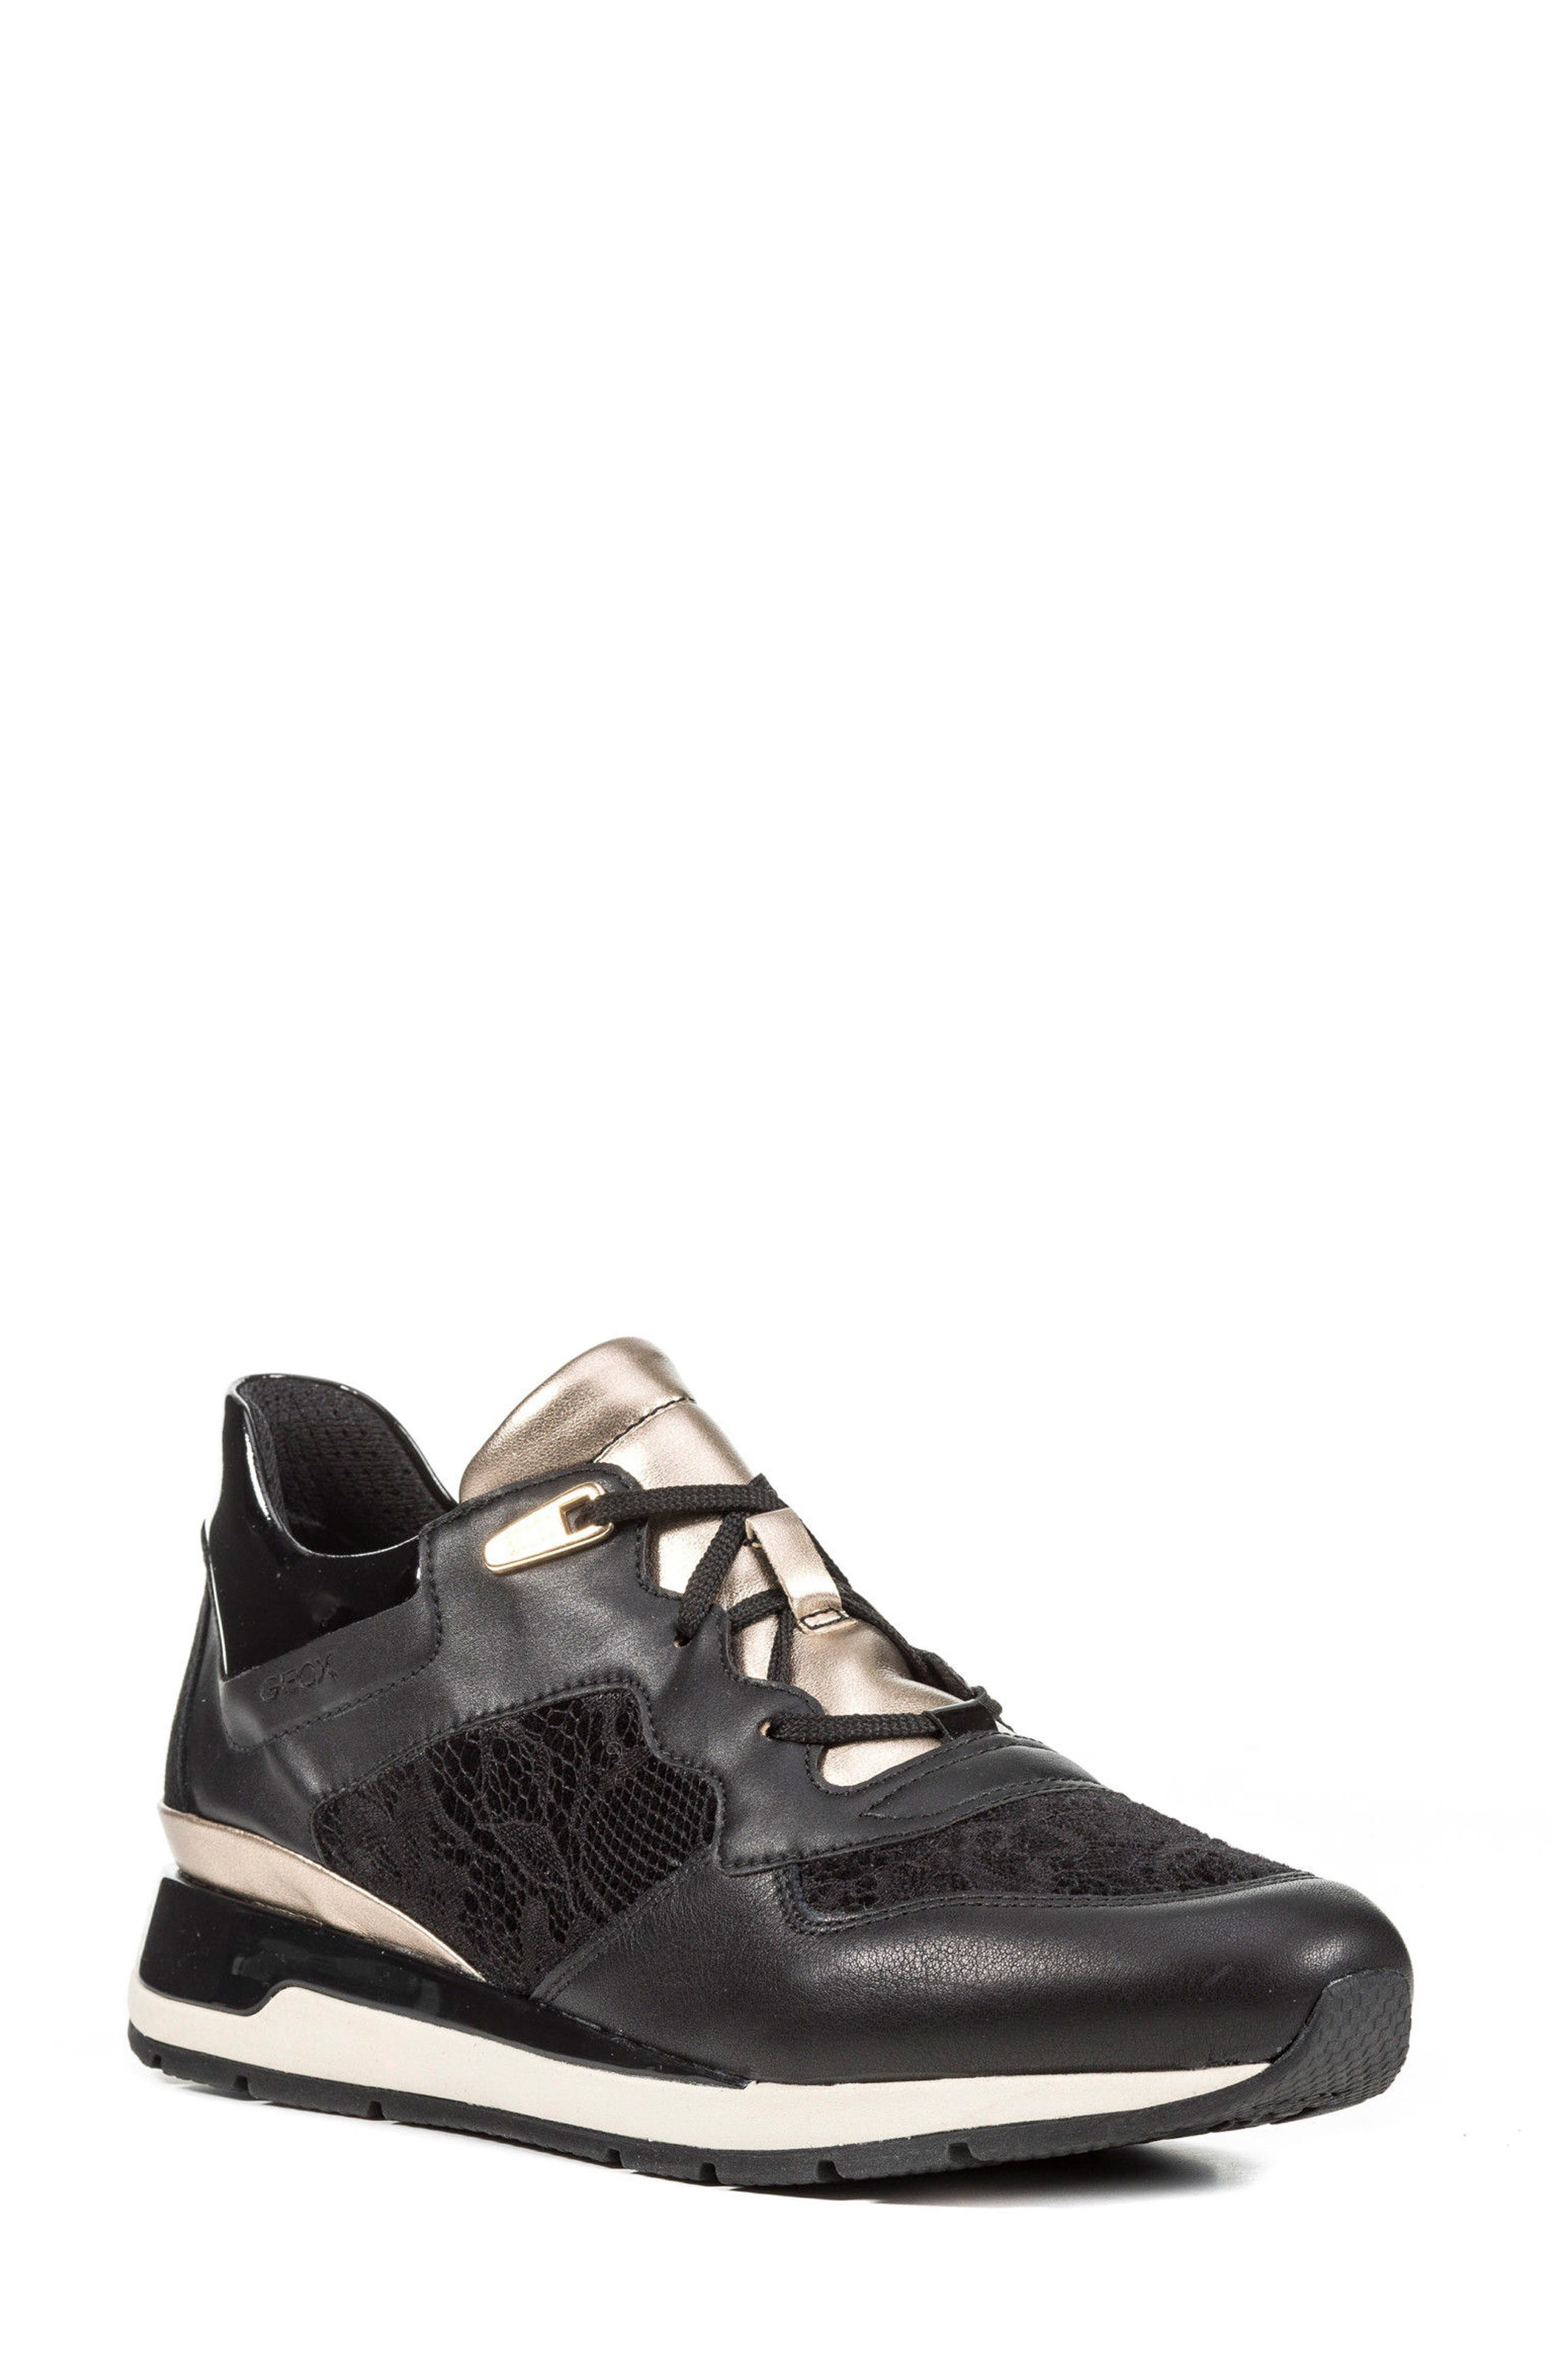 Alternate Image 1 Selected - Geox Shahira Sneaker (Women)